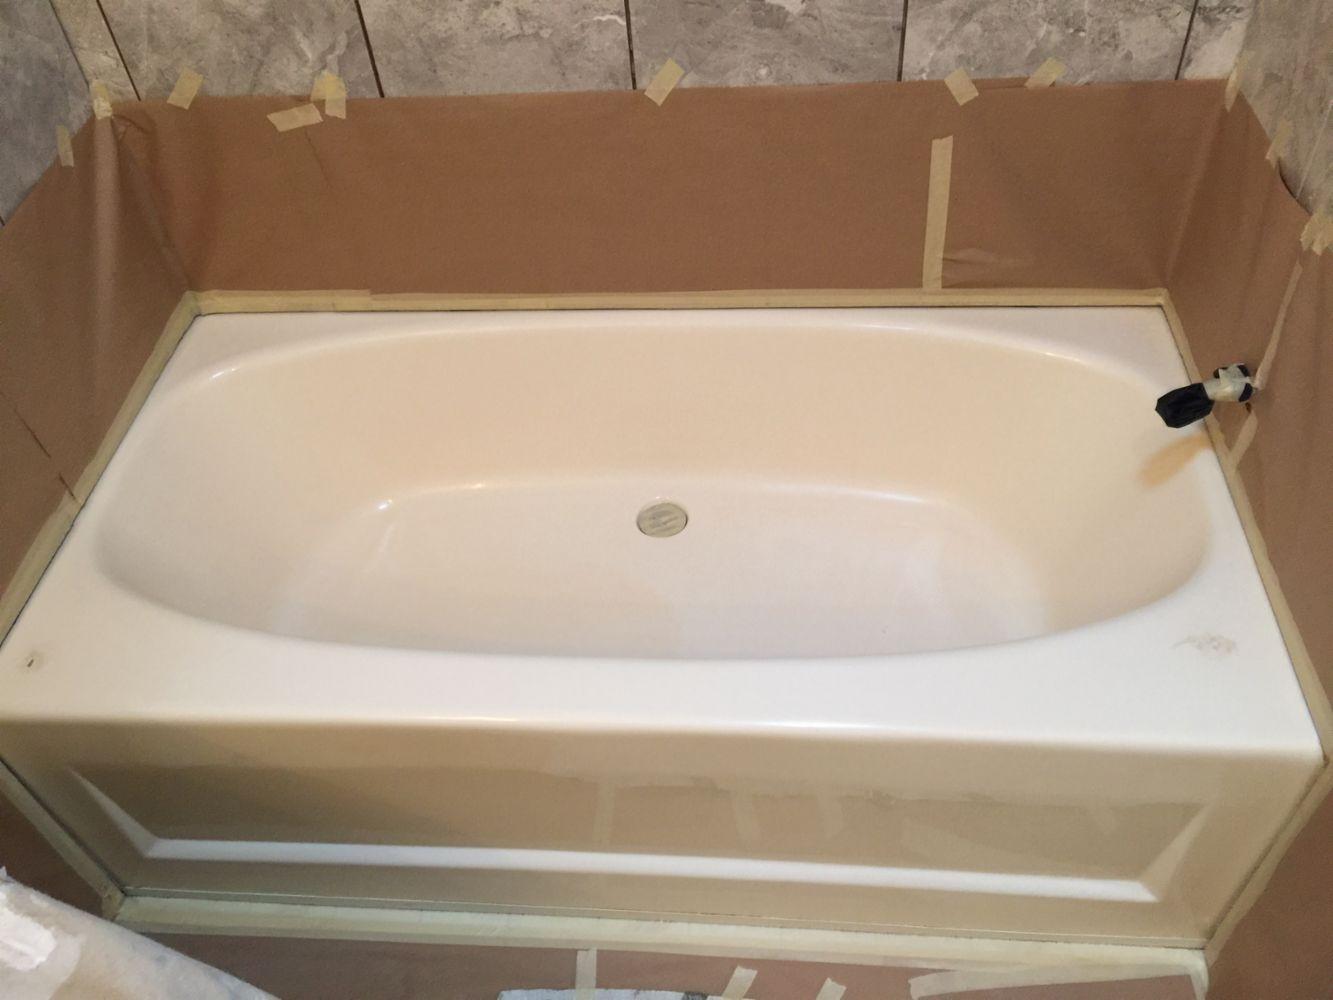 Pretty Can I Paint My Bathtub Small How To Paint A Bath Tub Regular Bathroom Refinishers Porcelain Refinishing Company Young Tub Reglazing DarkBathtub Refinishing Cost Bathroom Resurfacing Cost   Urevoo